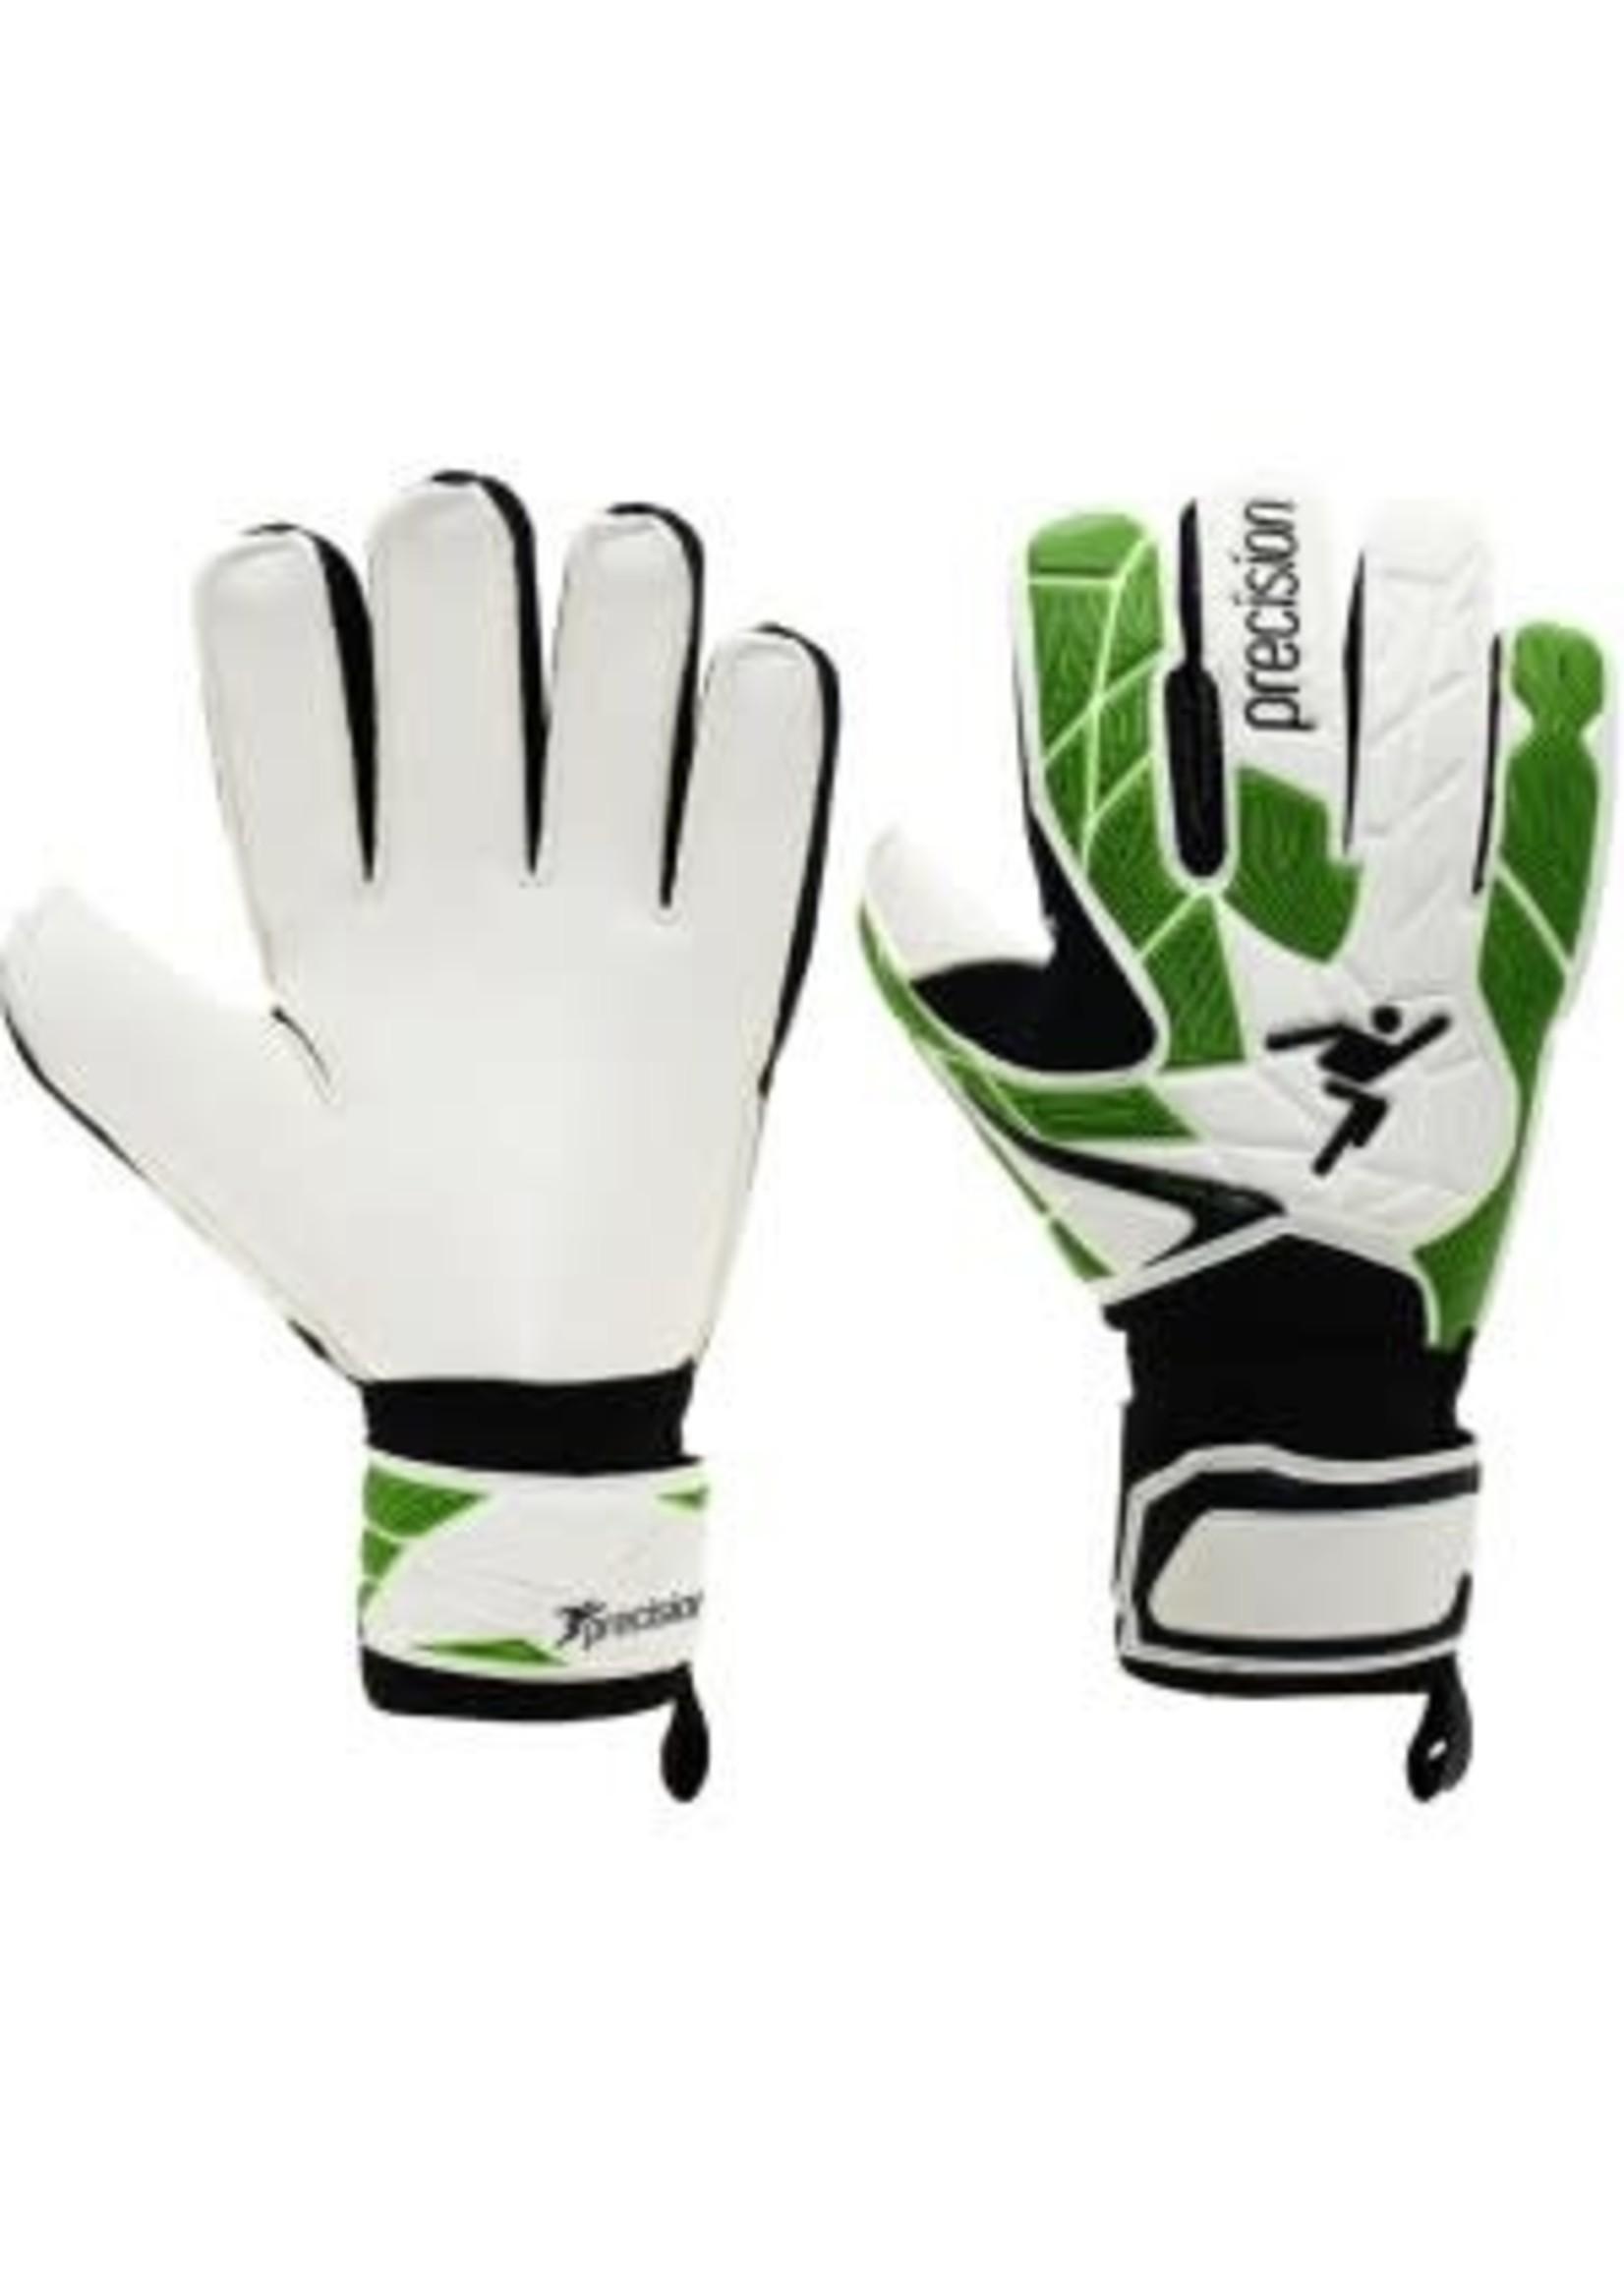 Precision Training Precision Fusion X 3D Flat Cut Basic Goalie Gloves, White